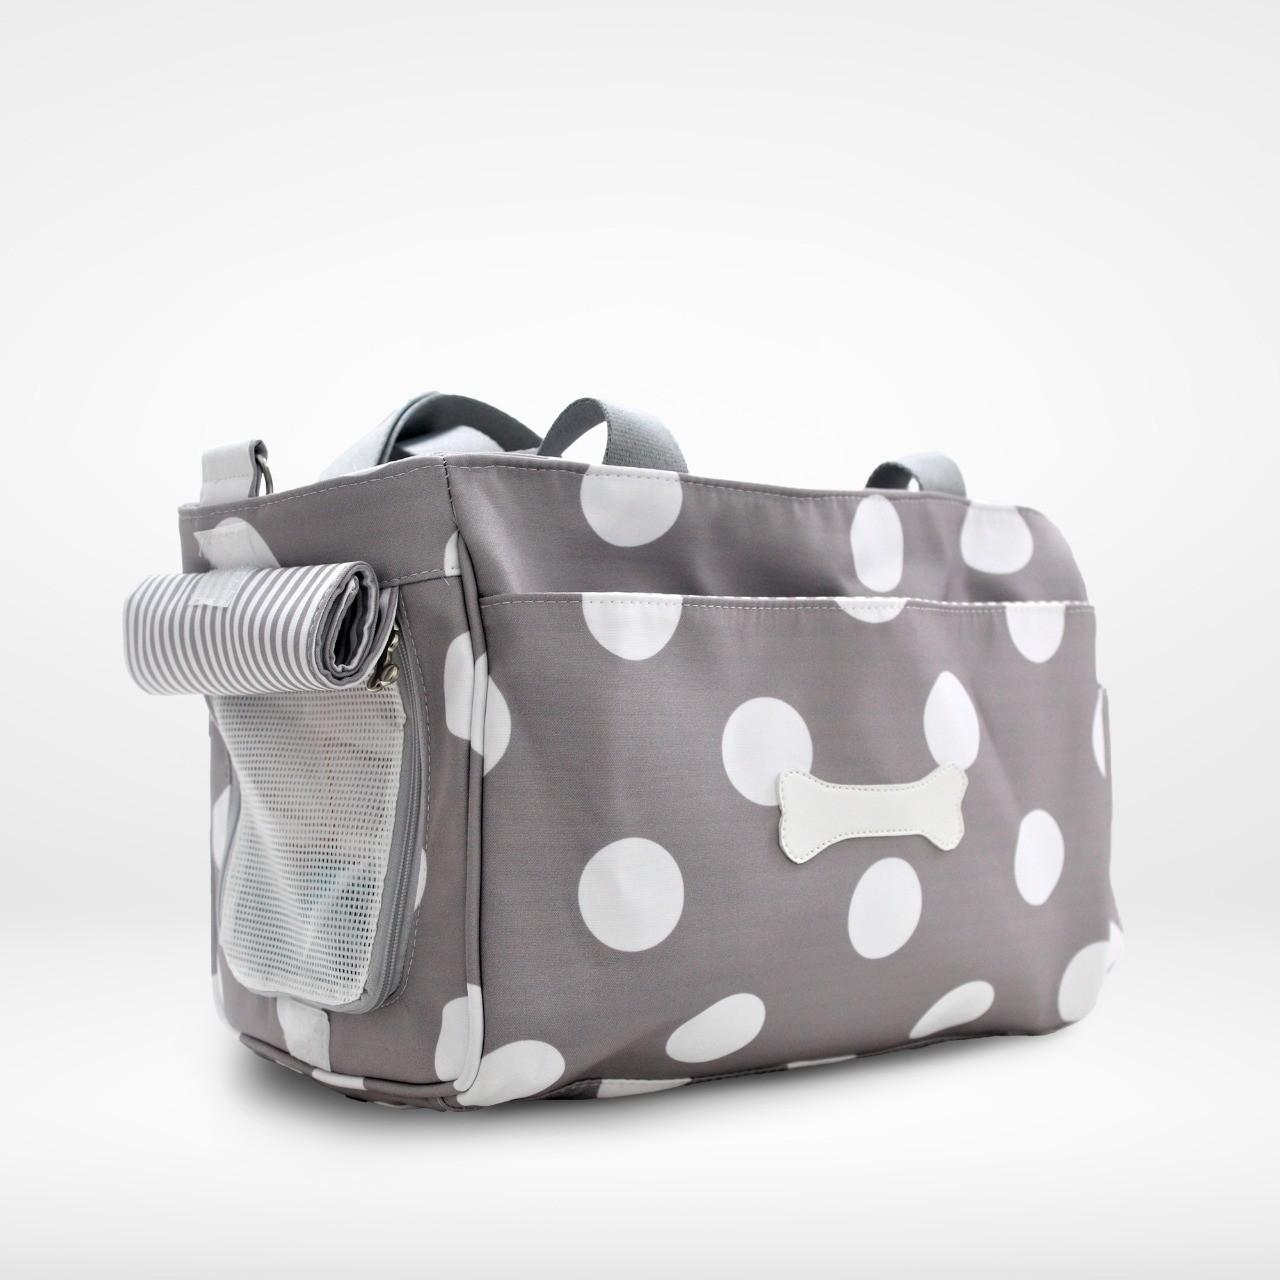 Bolsa Puppy Dog Cinza Bubble - Masterbag